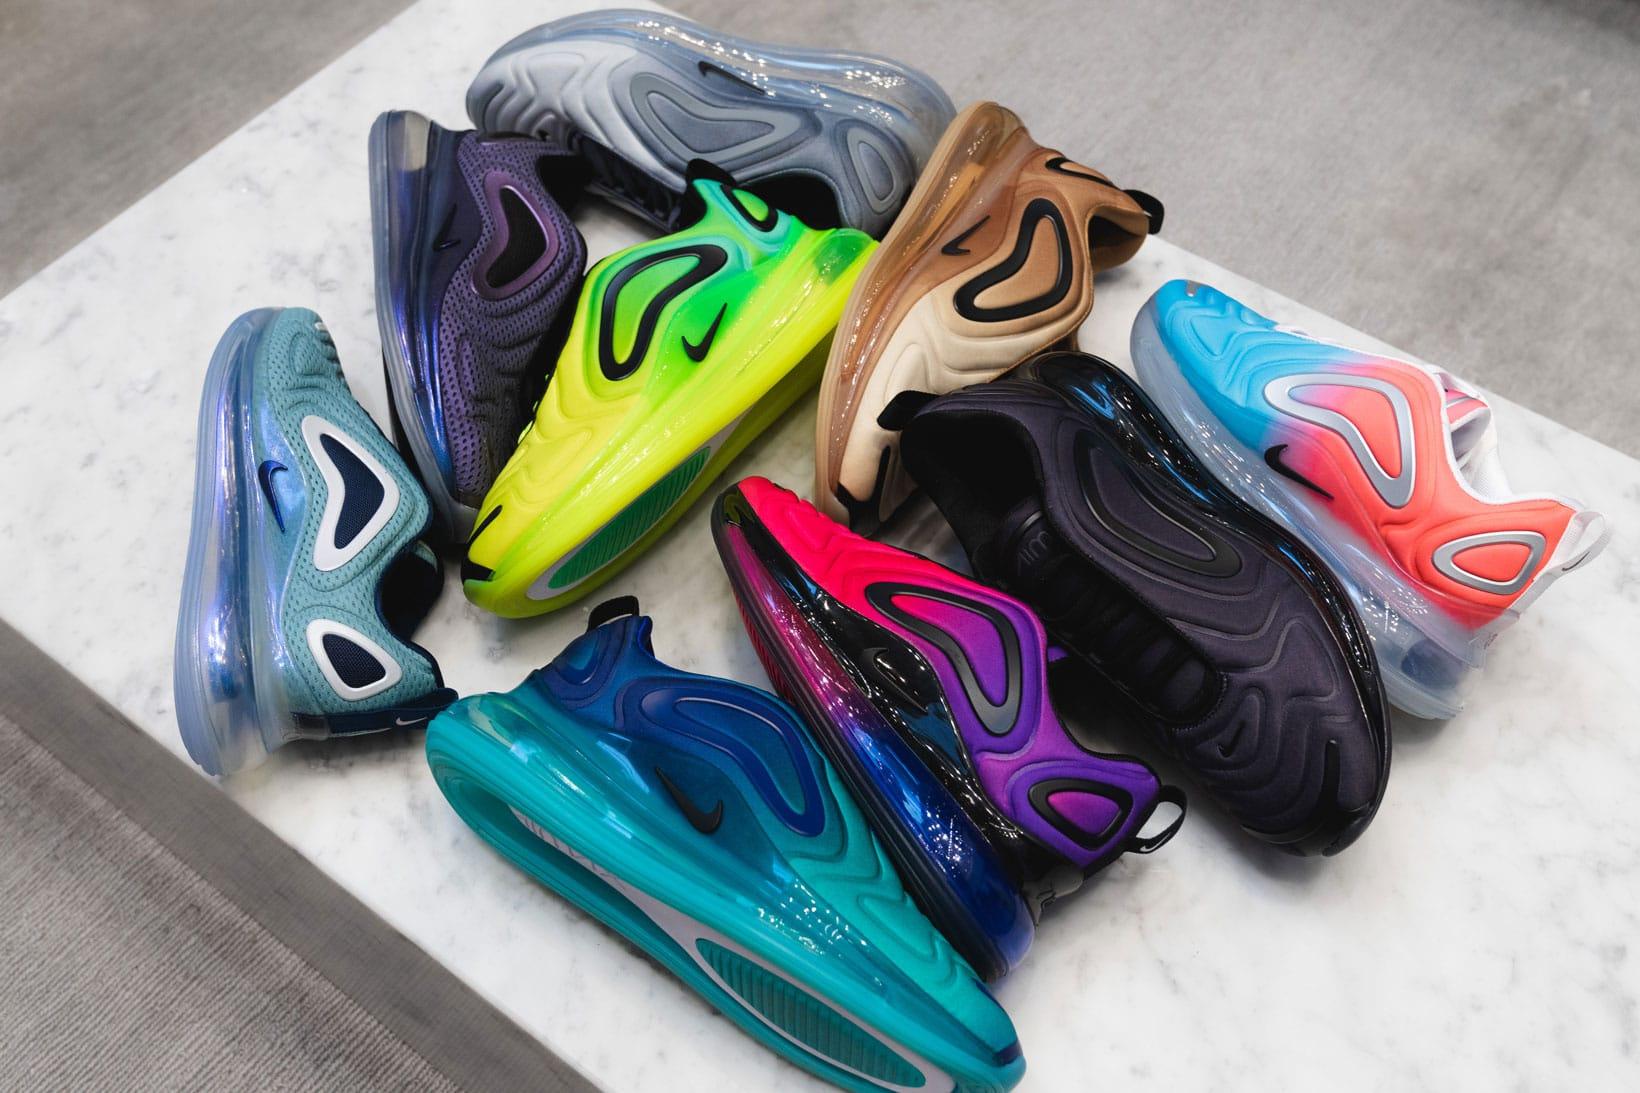 Nike Air Max 720 2019 Colorways Release